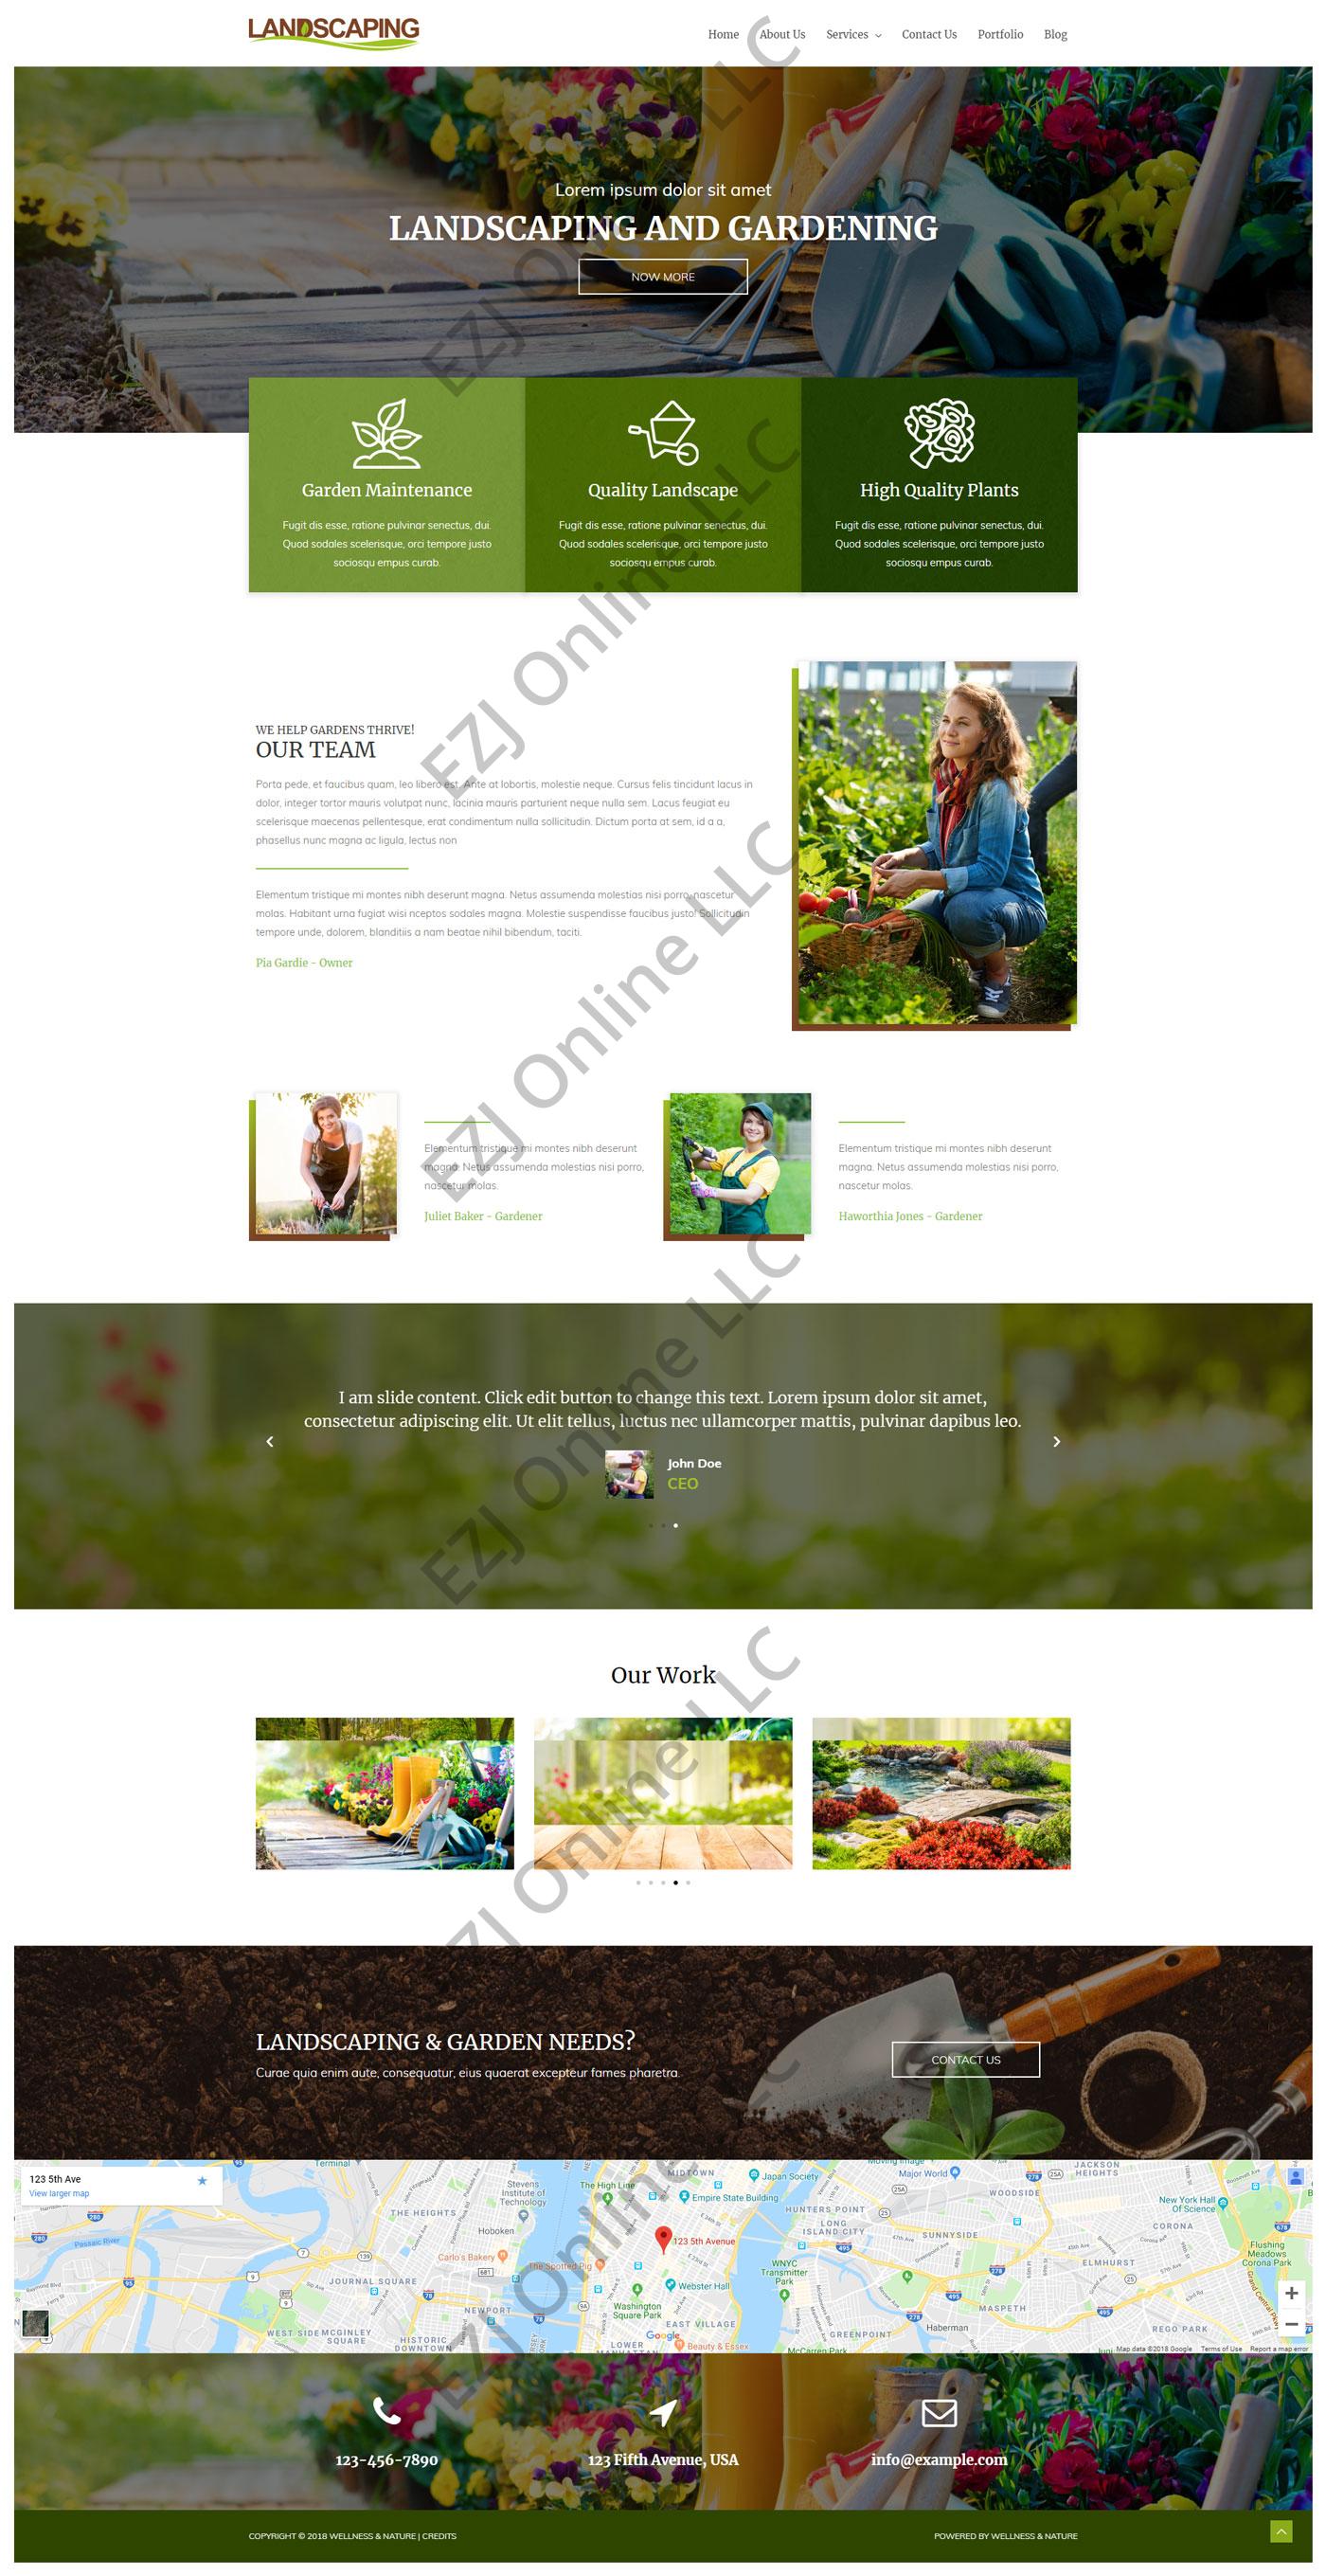 Website Design & Development Services In Albuquerque | EZJ Online